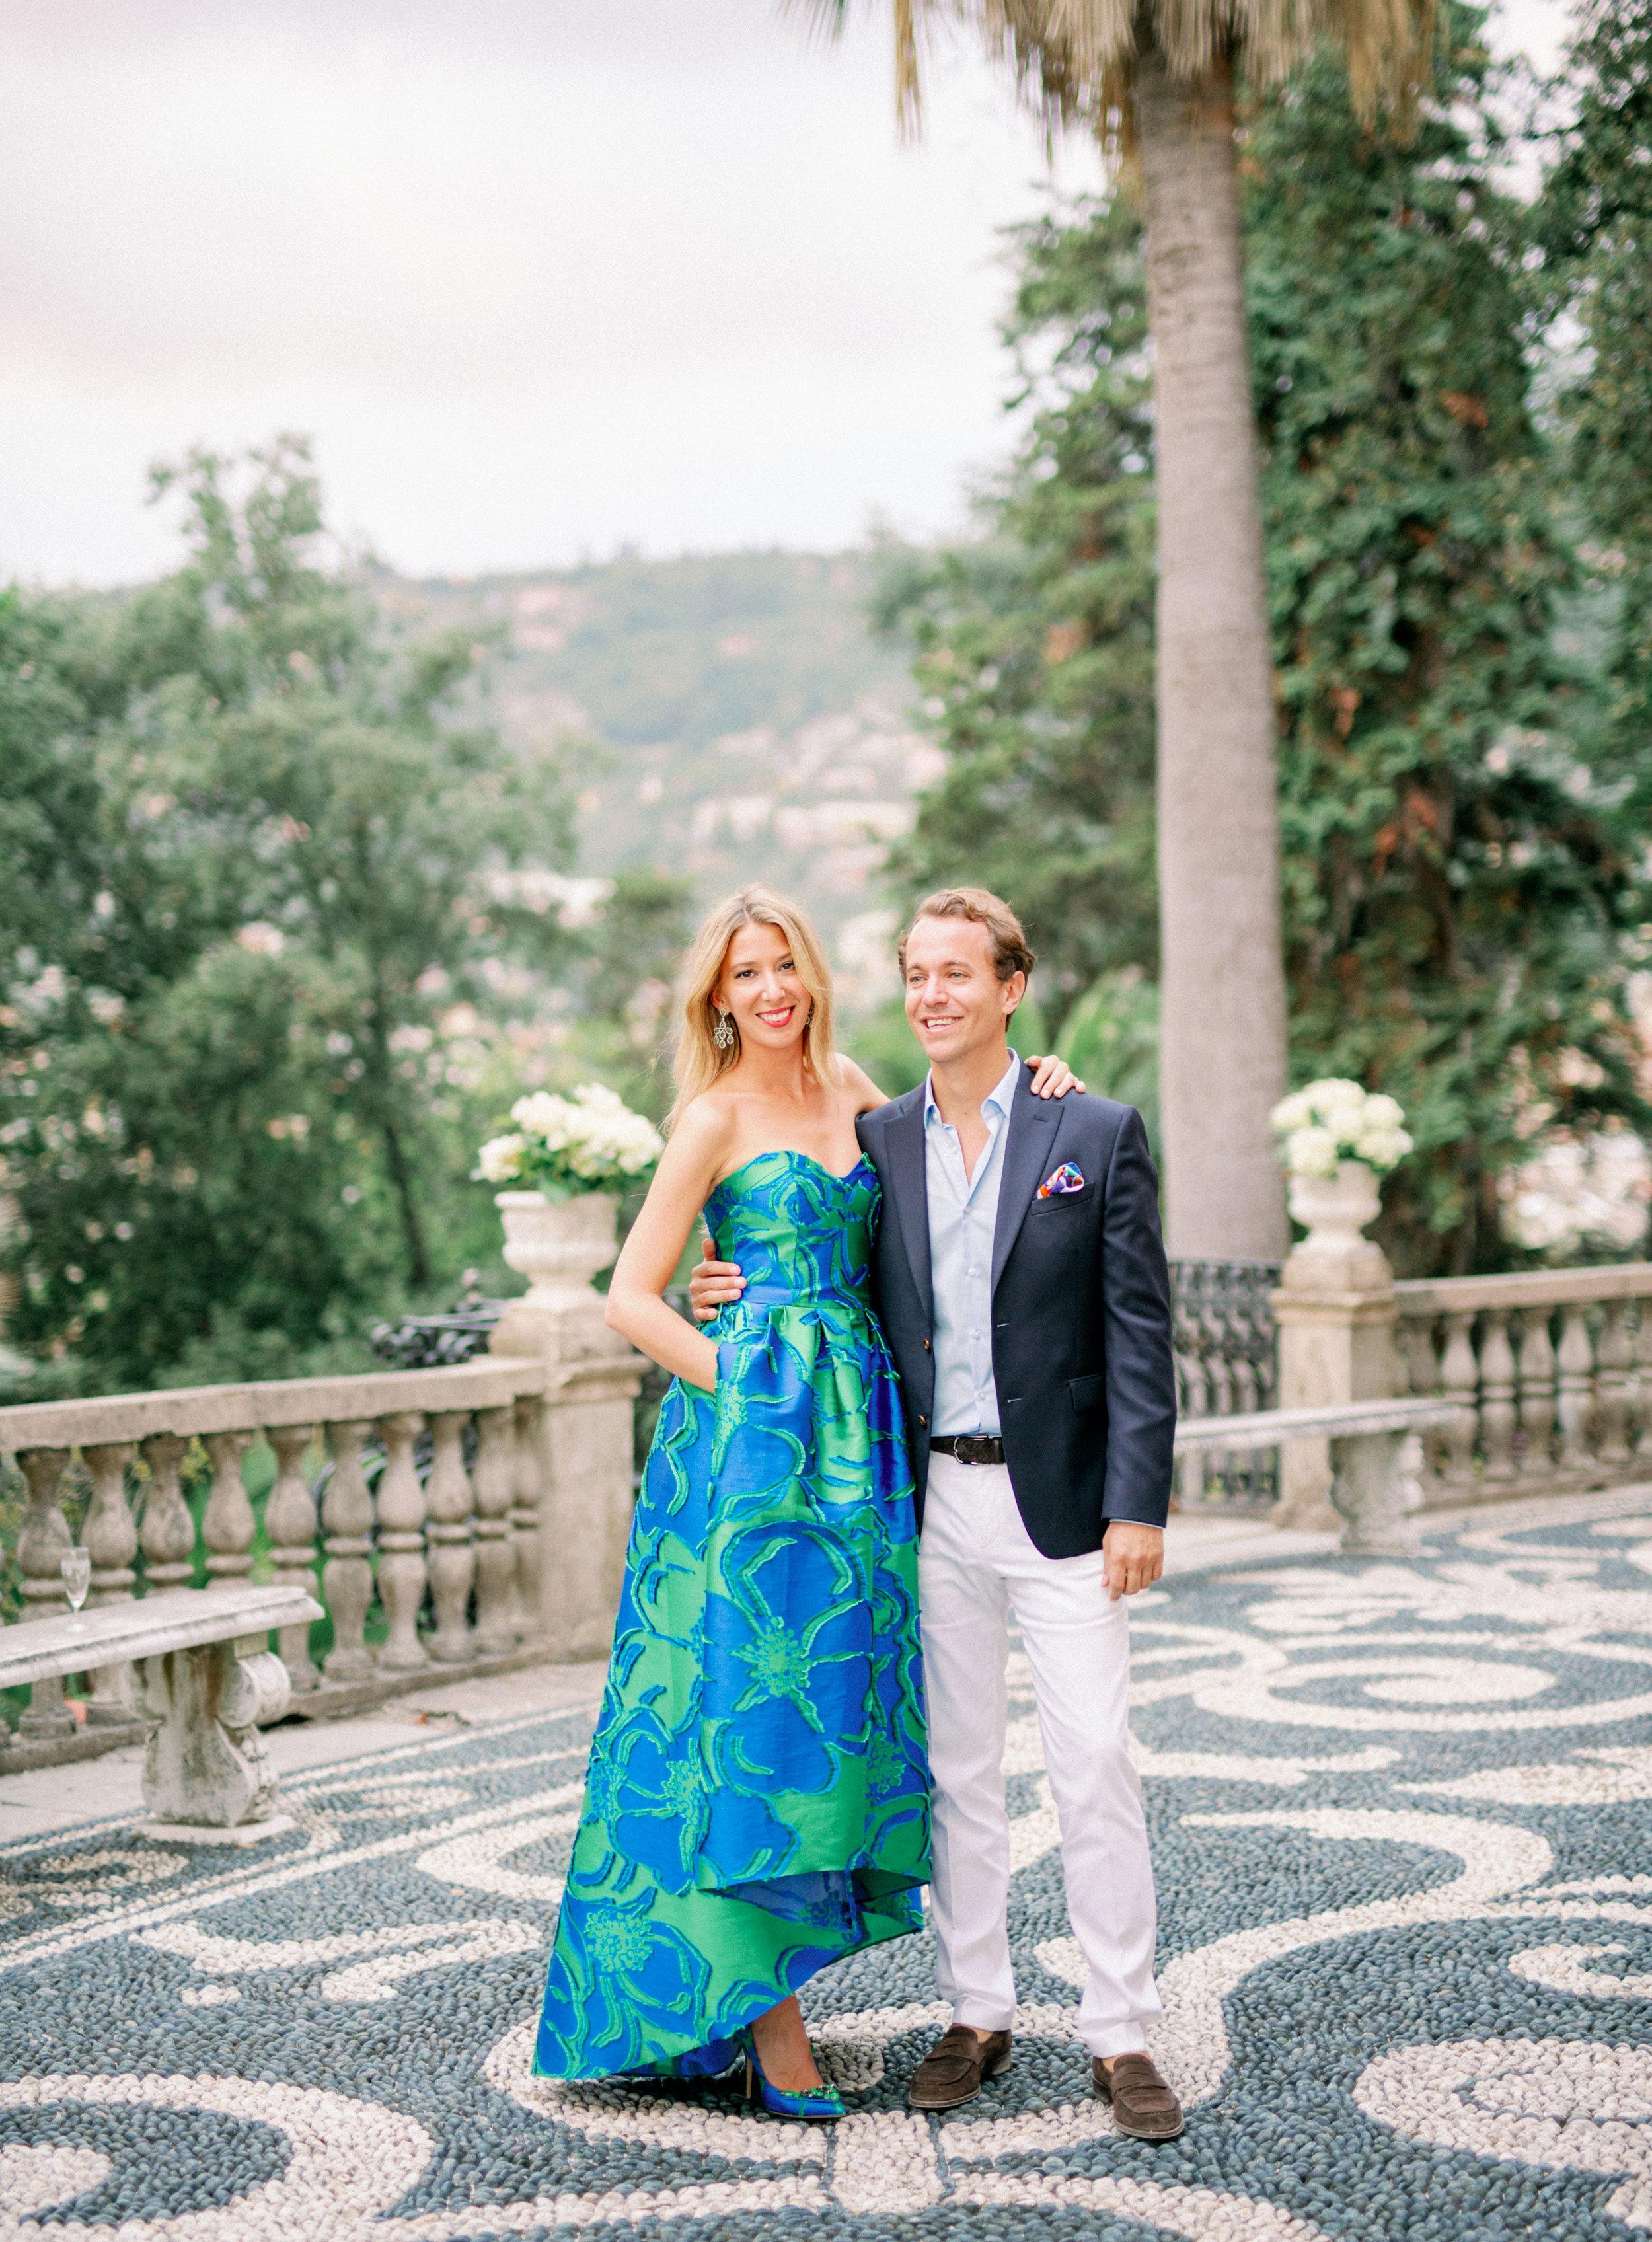 portofino-italy-destination-wedding-hunter-ryan-photo-8.jpg